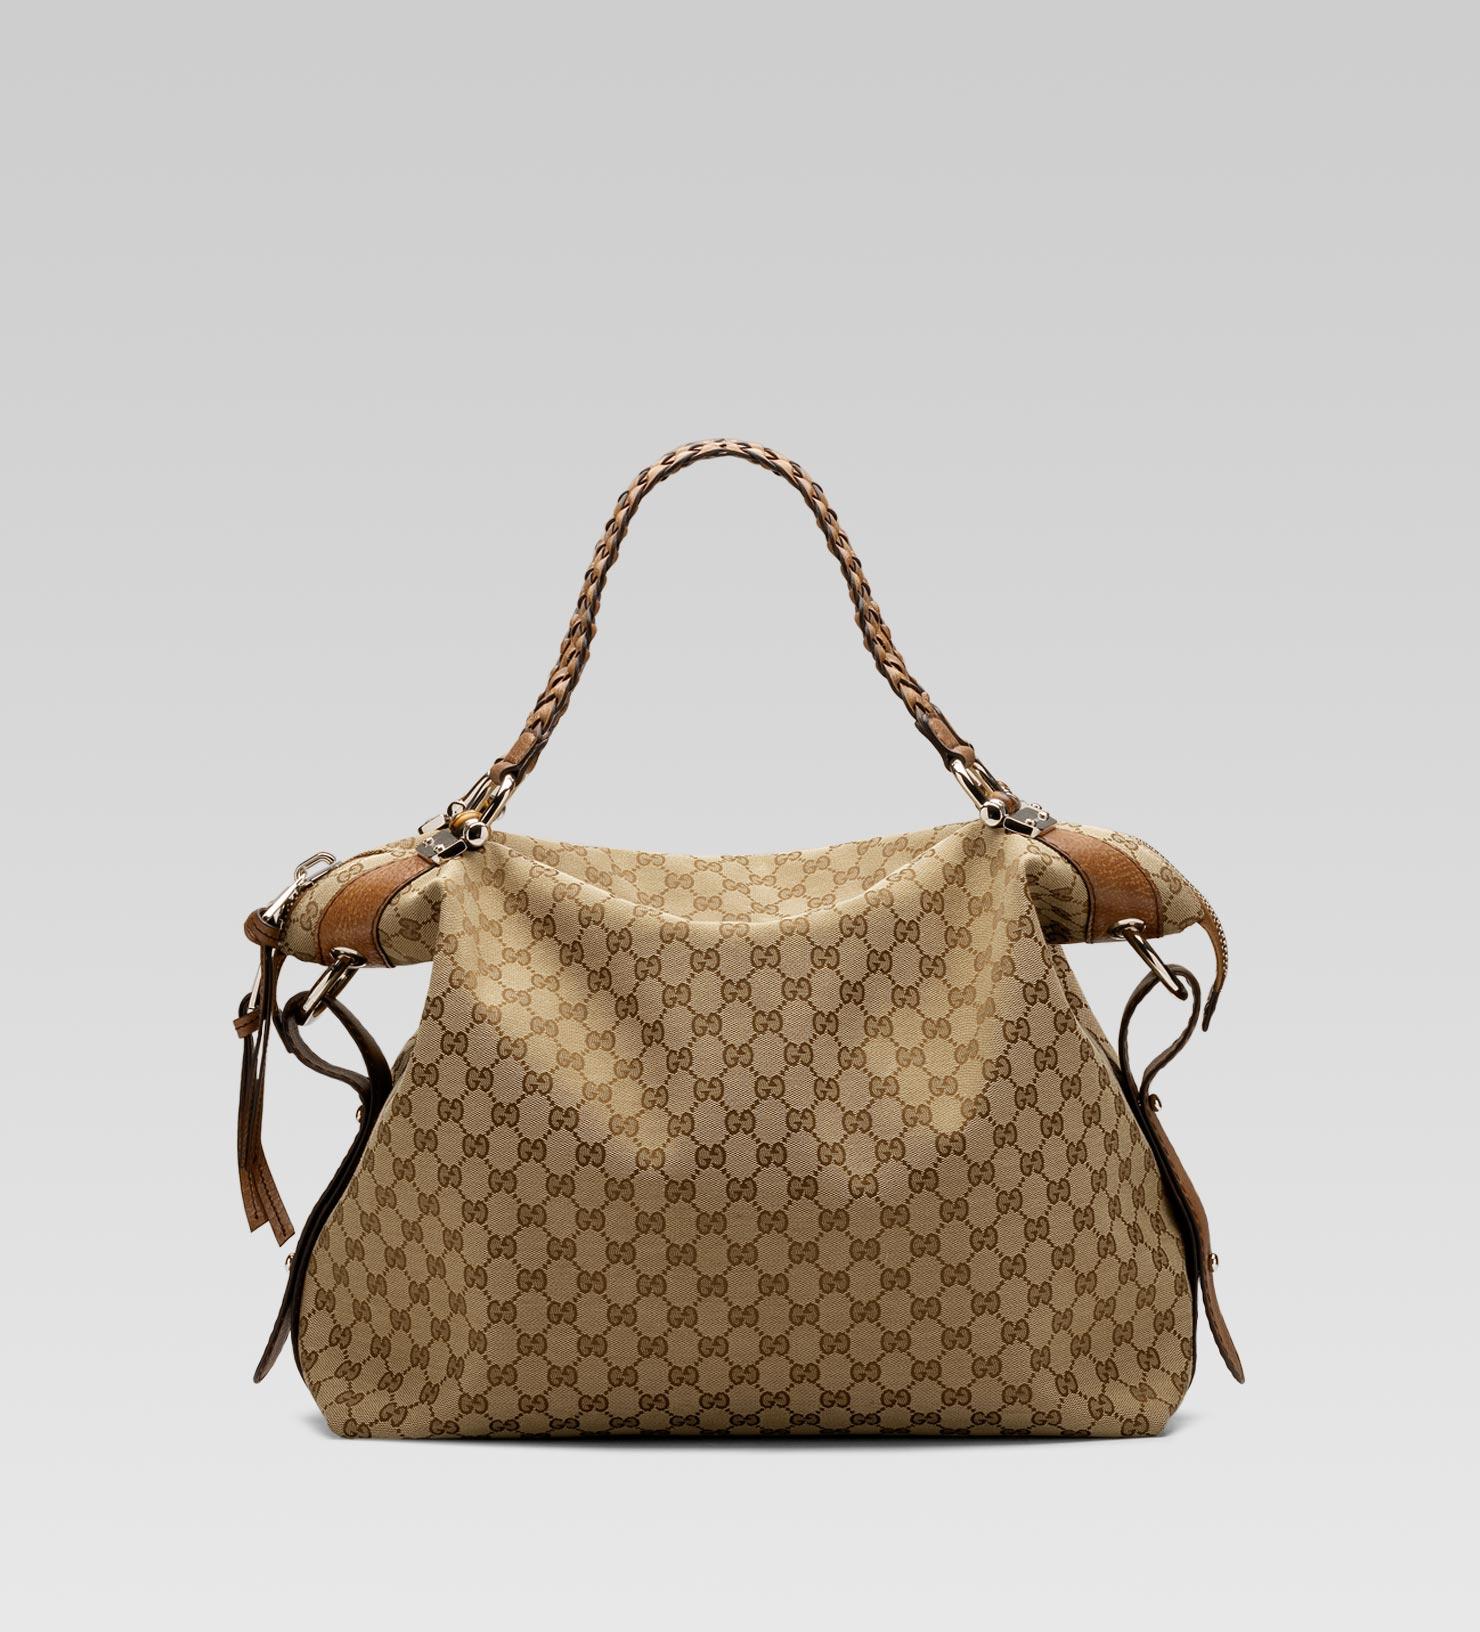 adb757205da1b0 Gucci Bamboo Bar Large Shoulder Bag with Tassels and Bamboo Detail ...